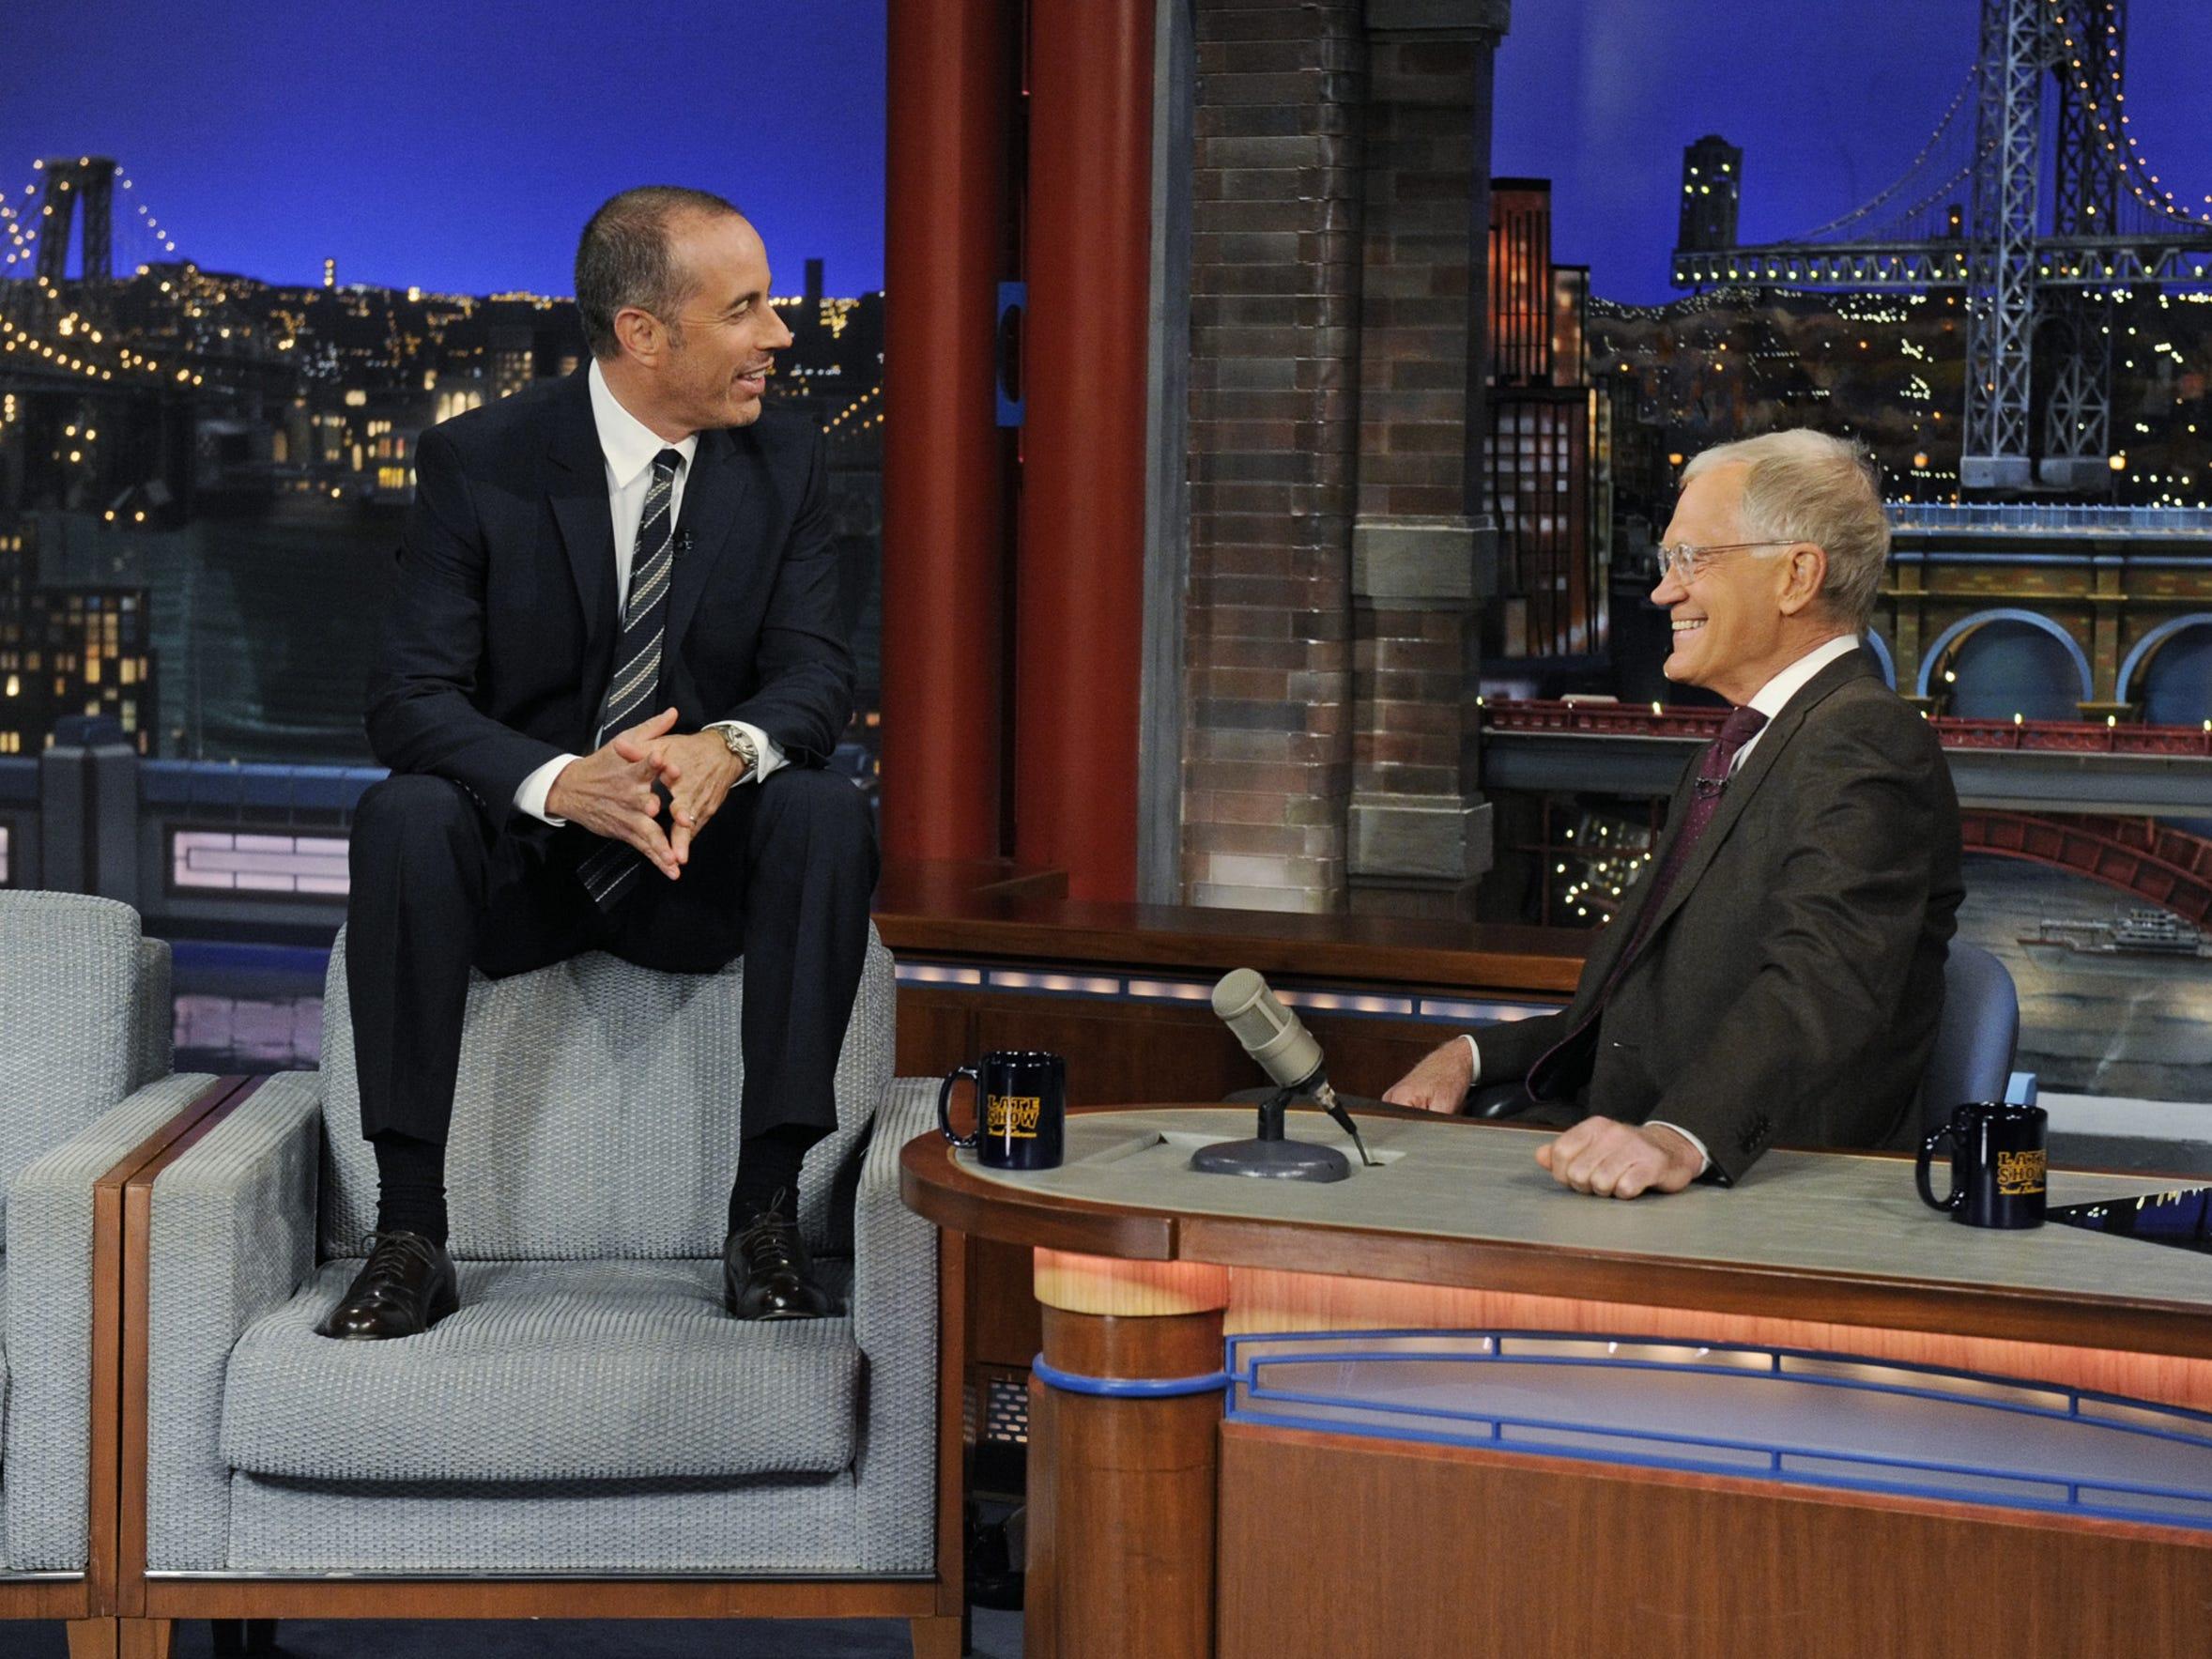 David Letterman Interviews Comedian Jerry Seinfeld